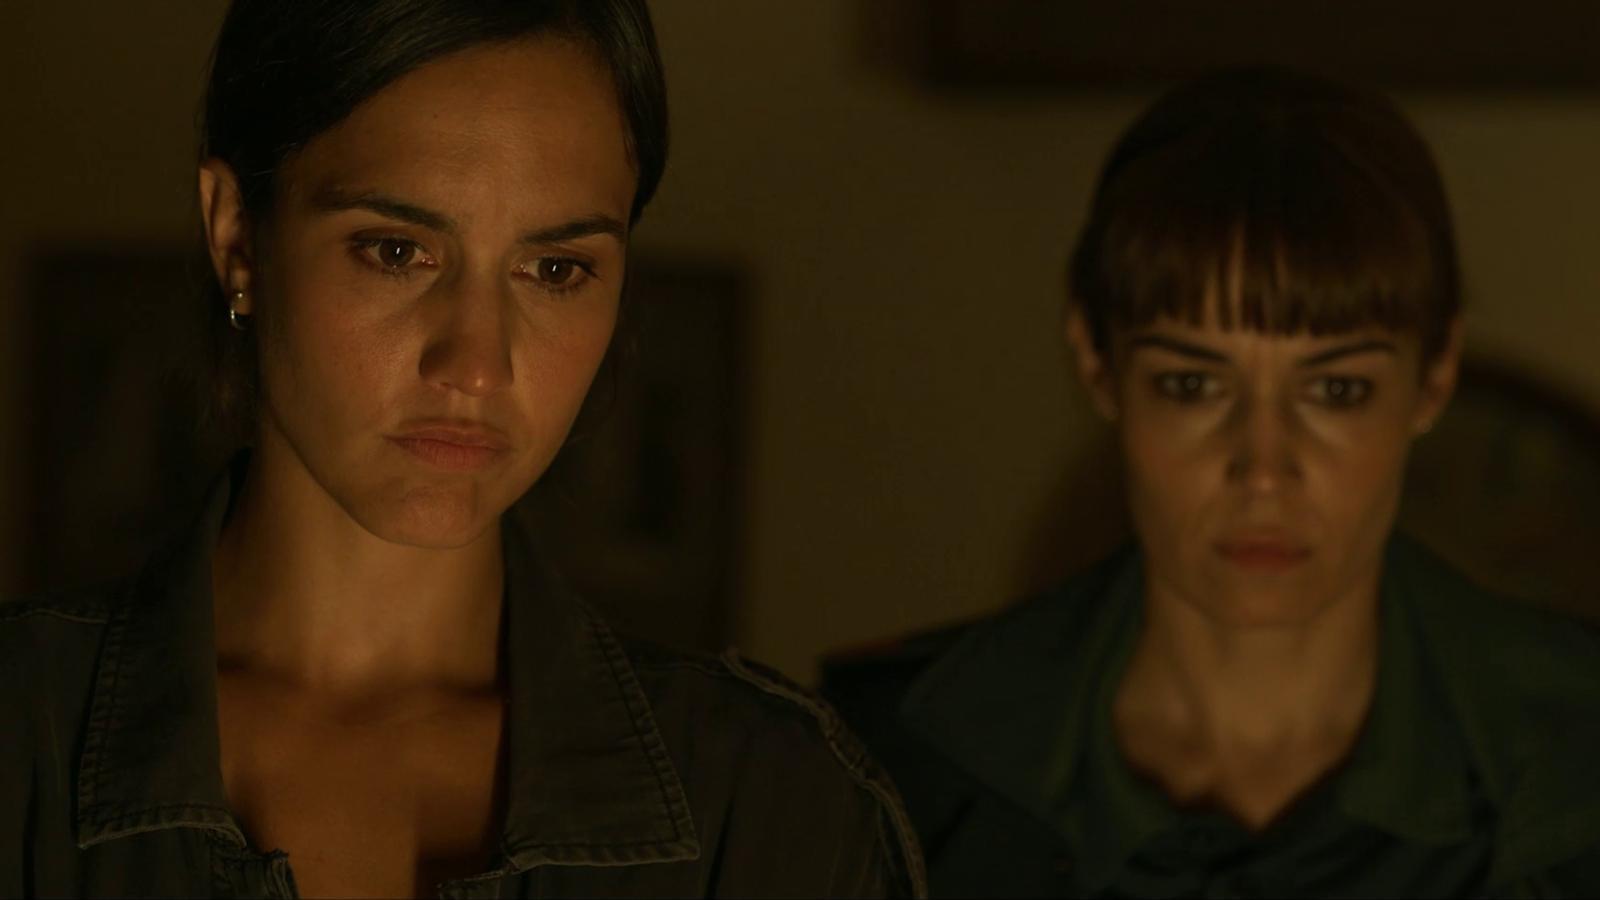 La 1 estrena 'La caza. Tramuntana', rodada a Valldemossa